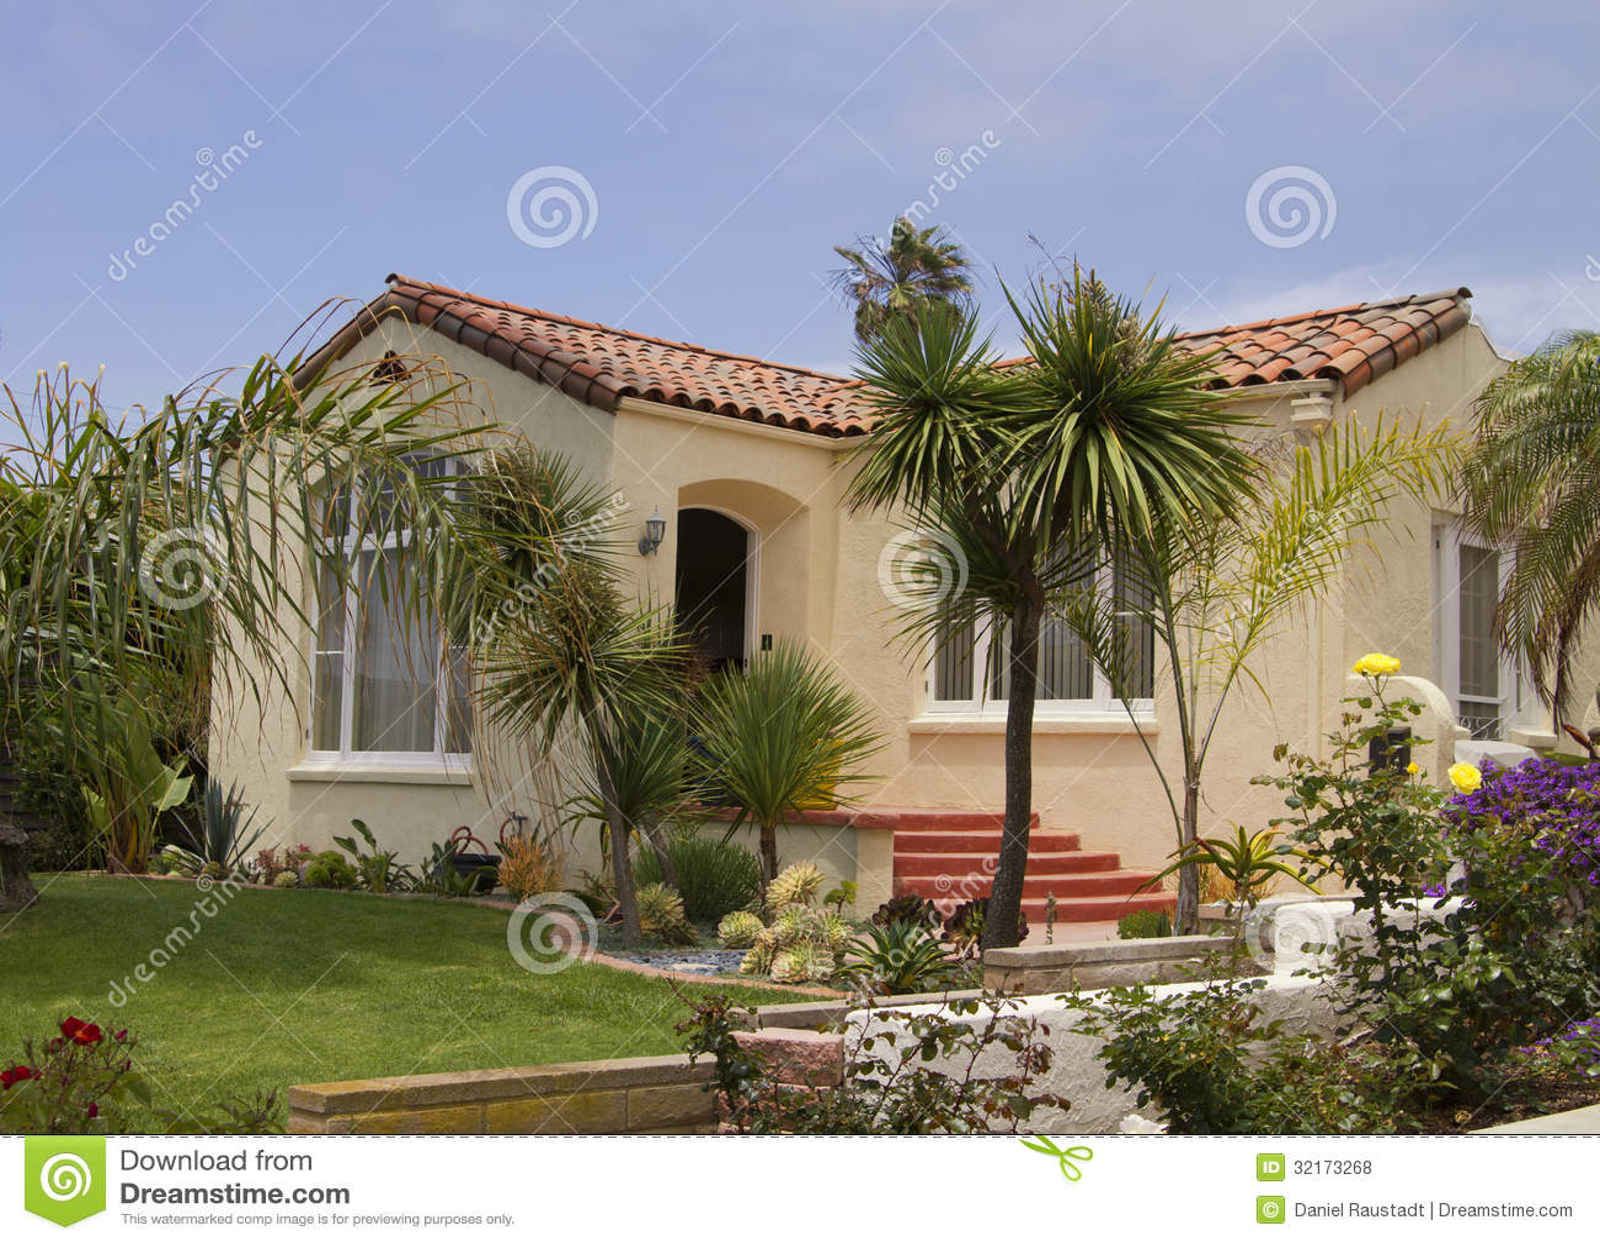 Southern California Ocean Beach House Royalty Free Stock Photos Image 3217